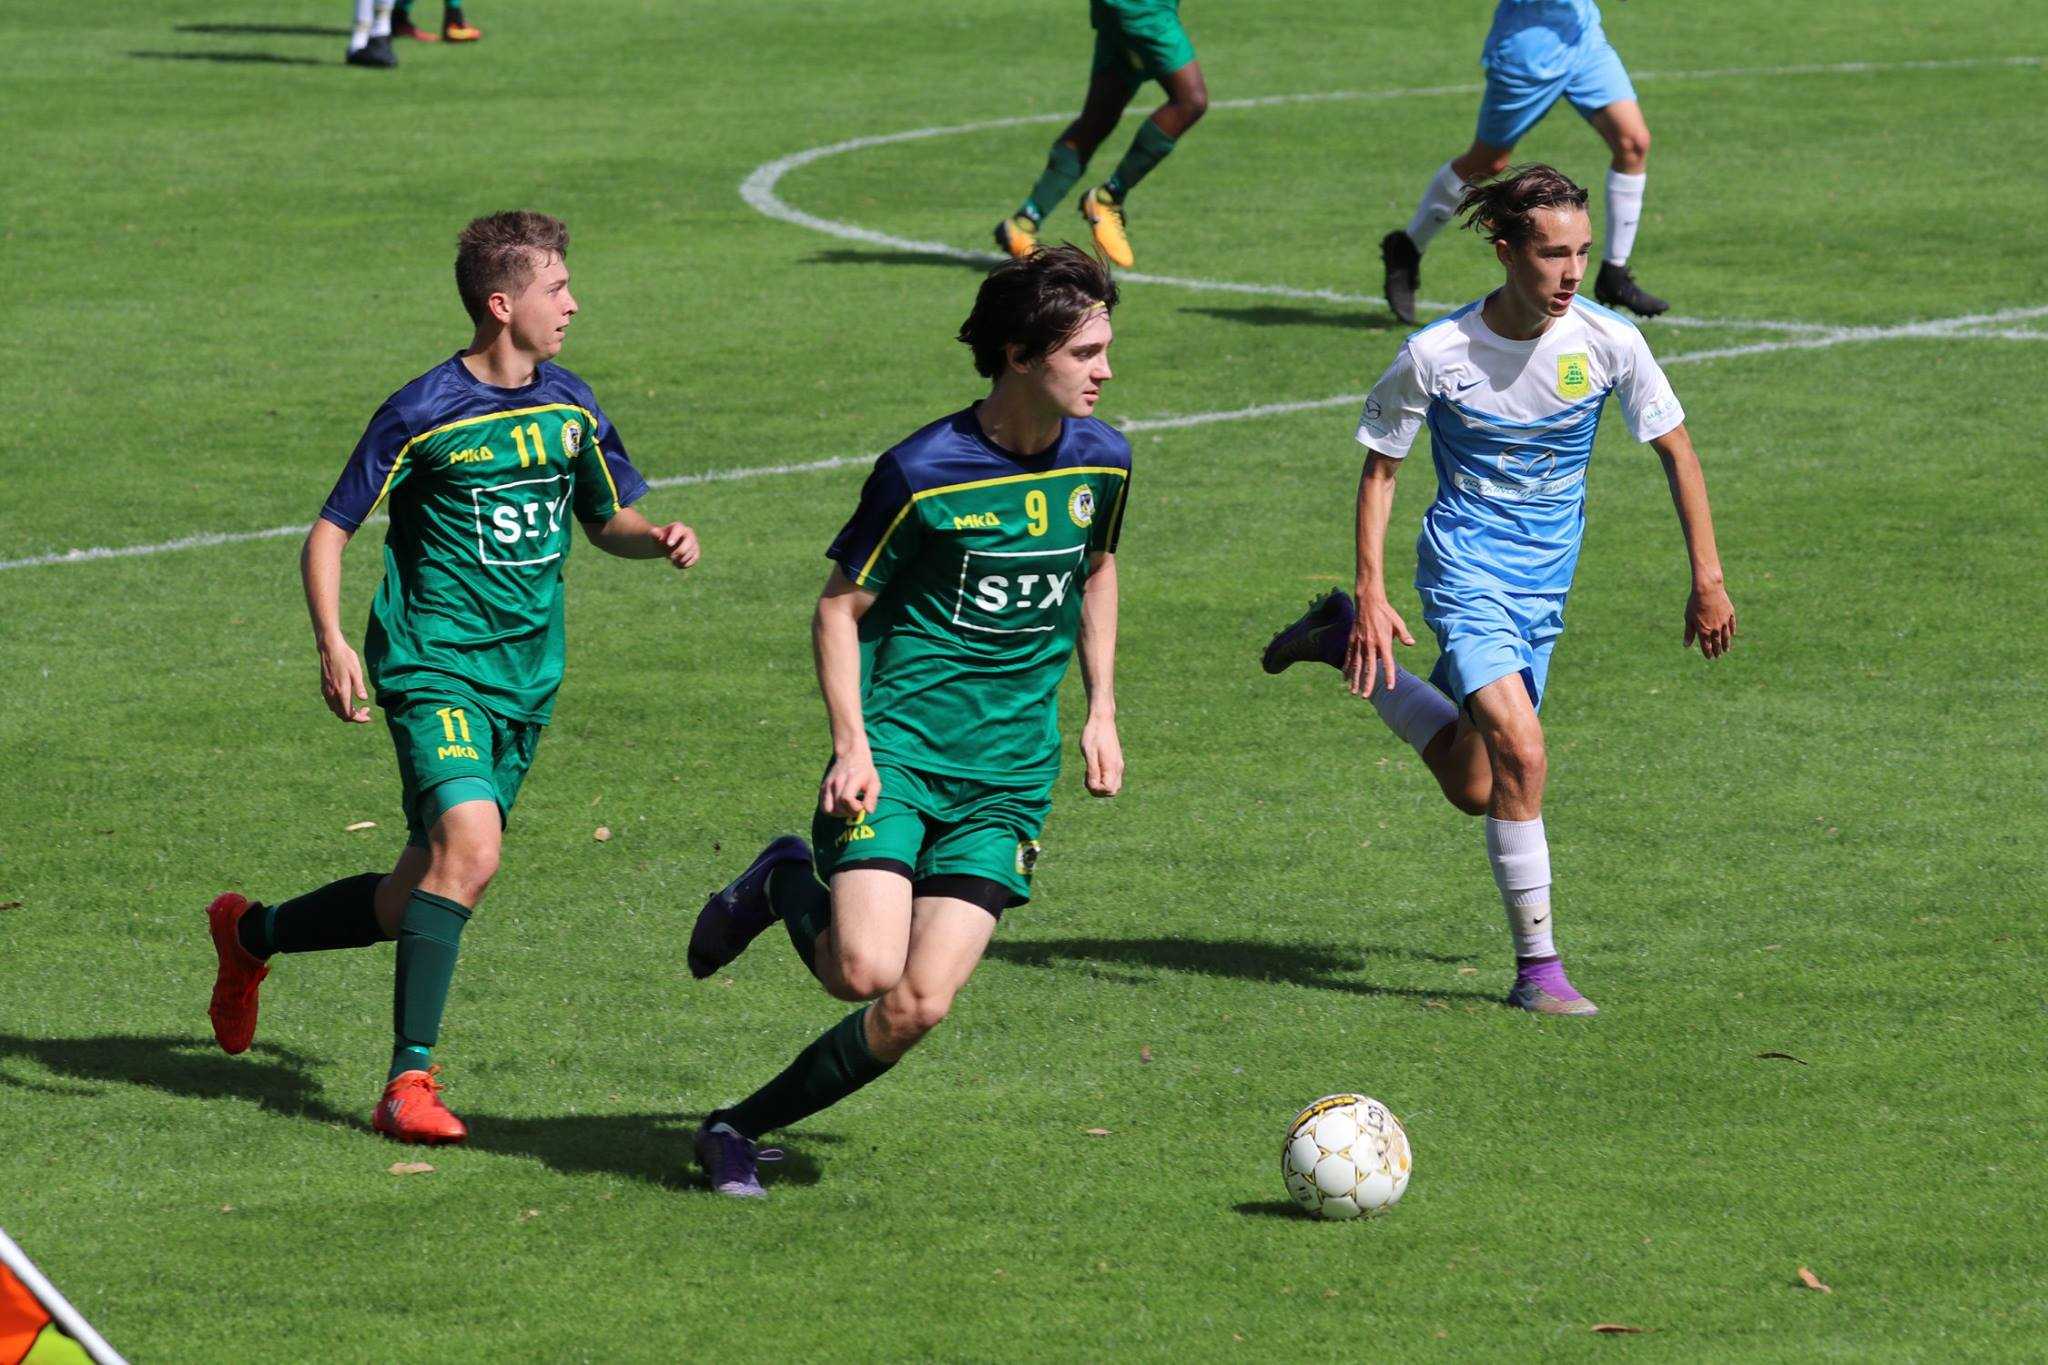 THE U18's ENJOYED ANOTHER BIG 3-0 WIN - CREDIT: GABRIELE MALUGA